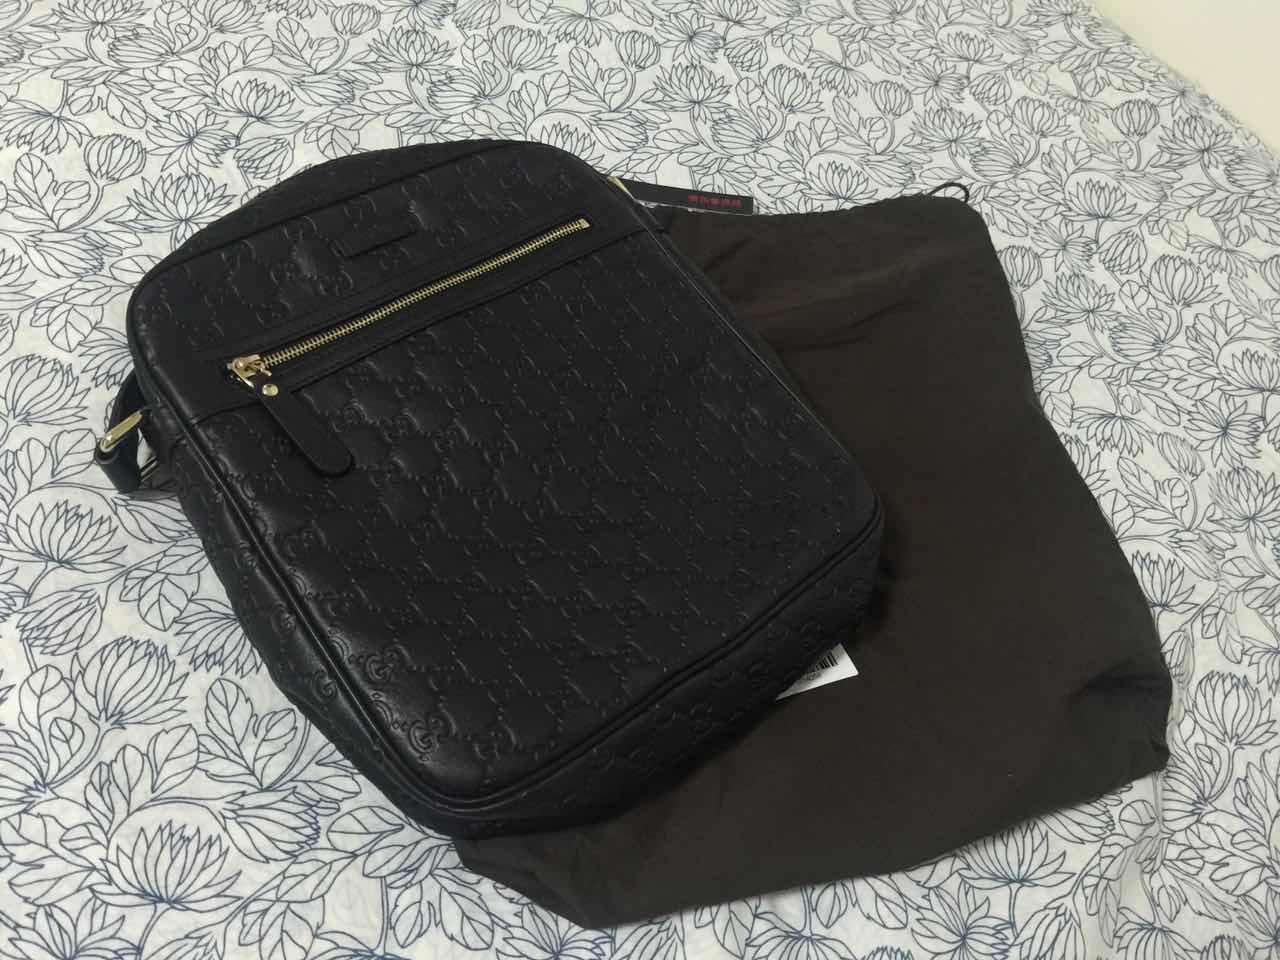 gel-kayano 20 lite-show t39sq 00964789 forsale